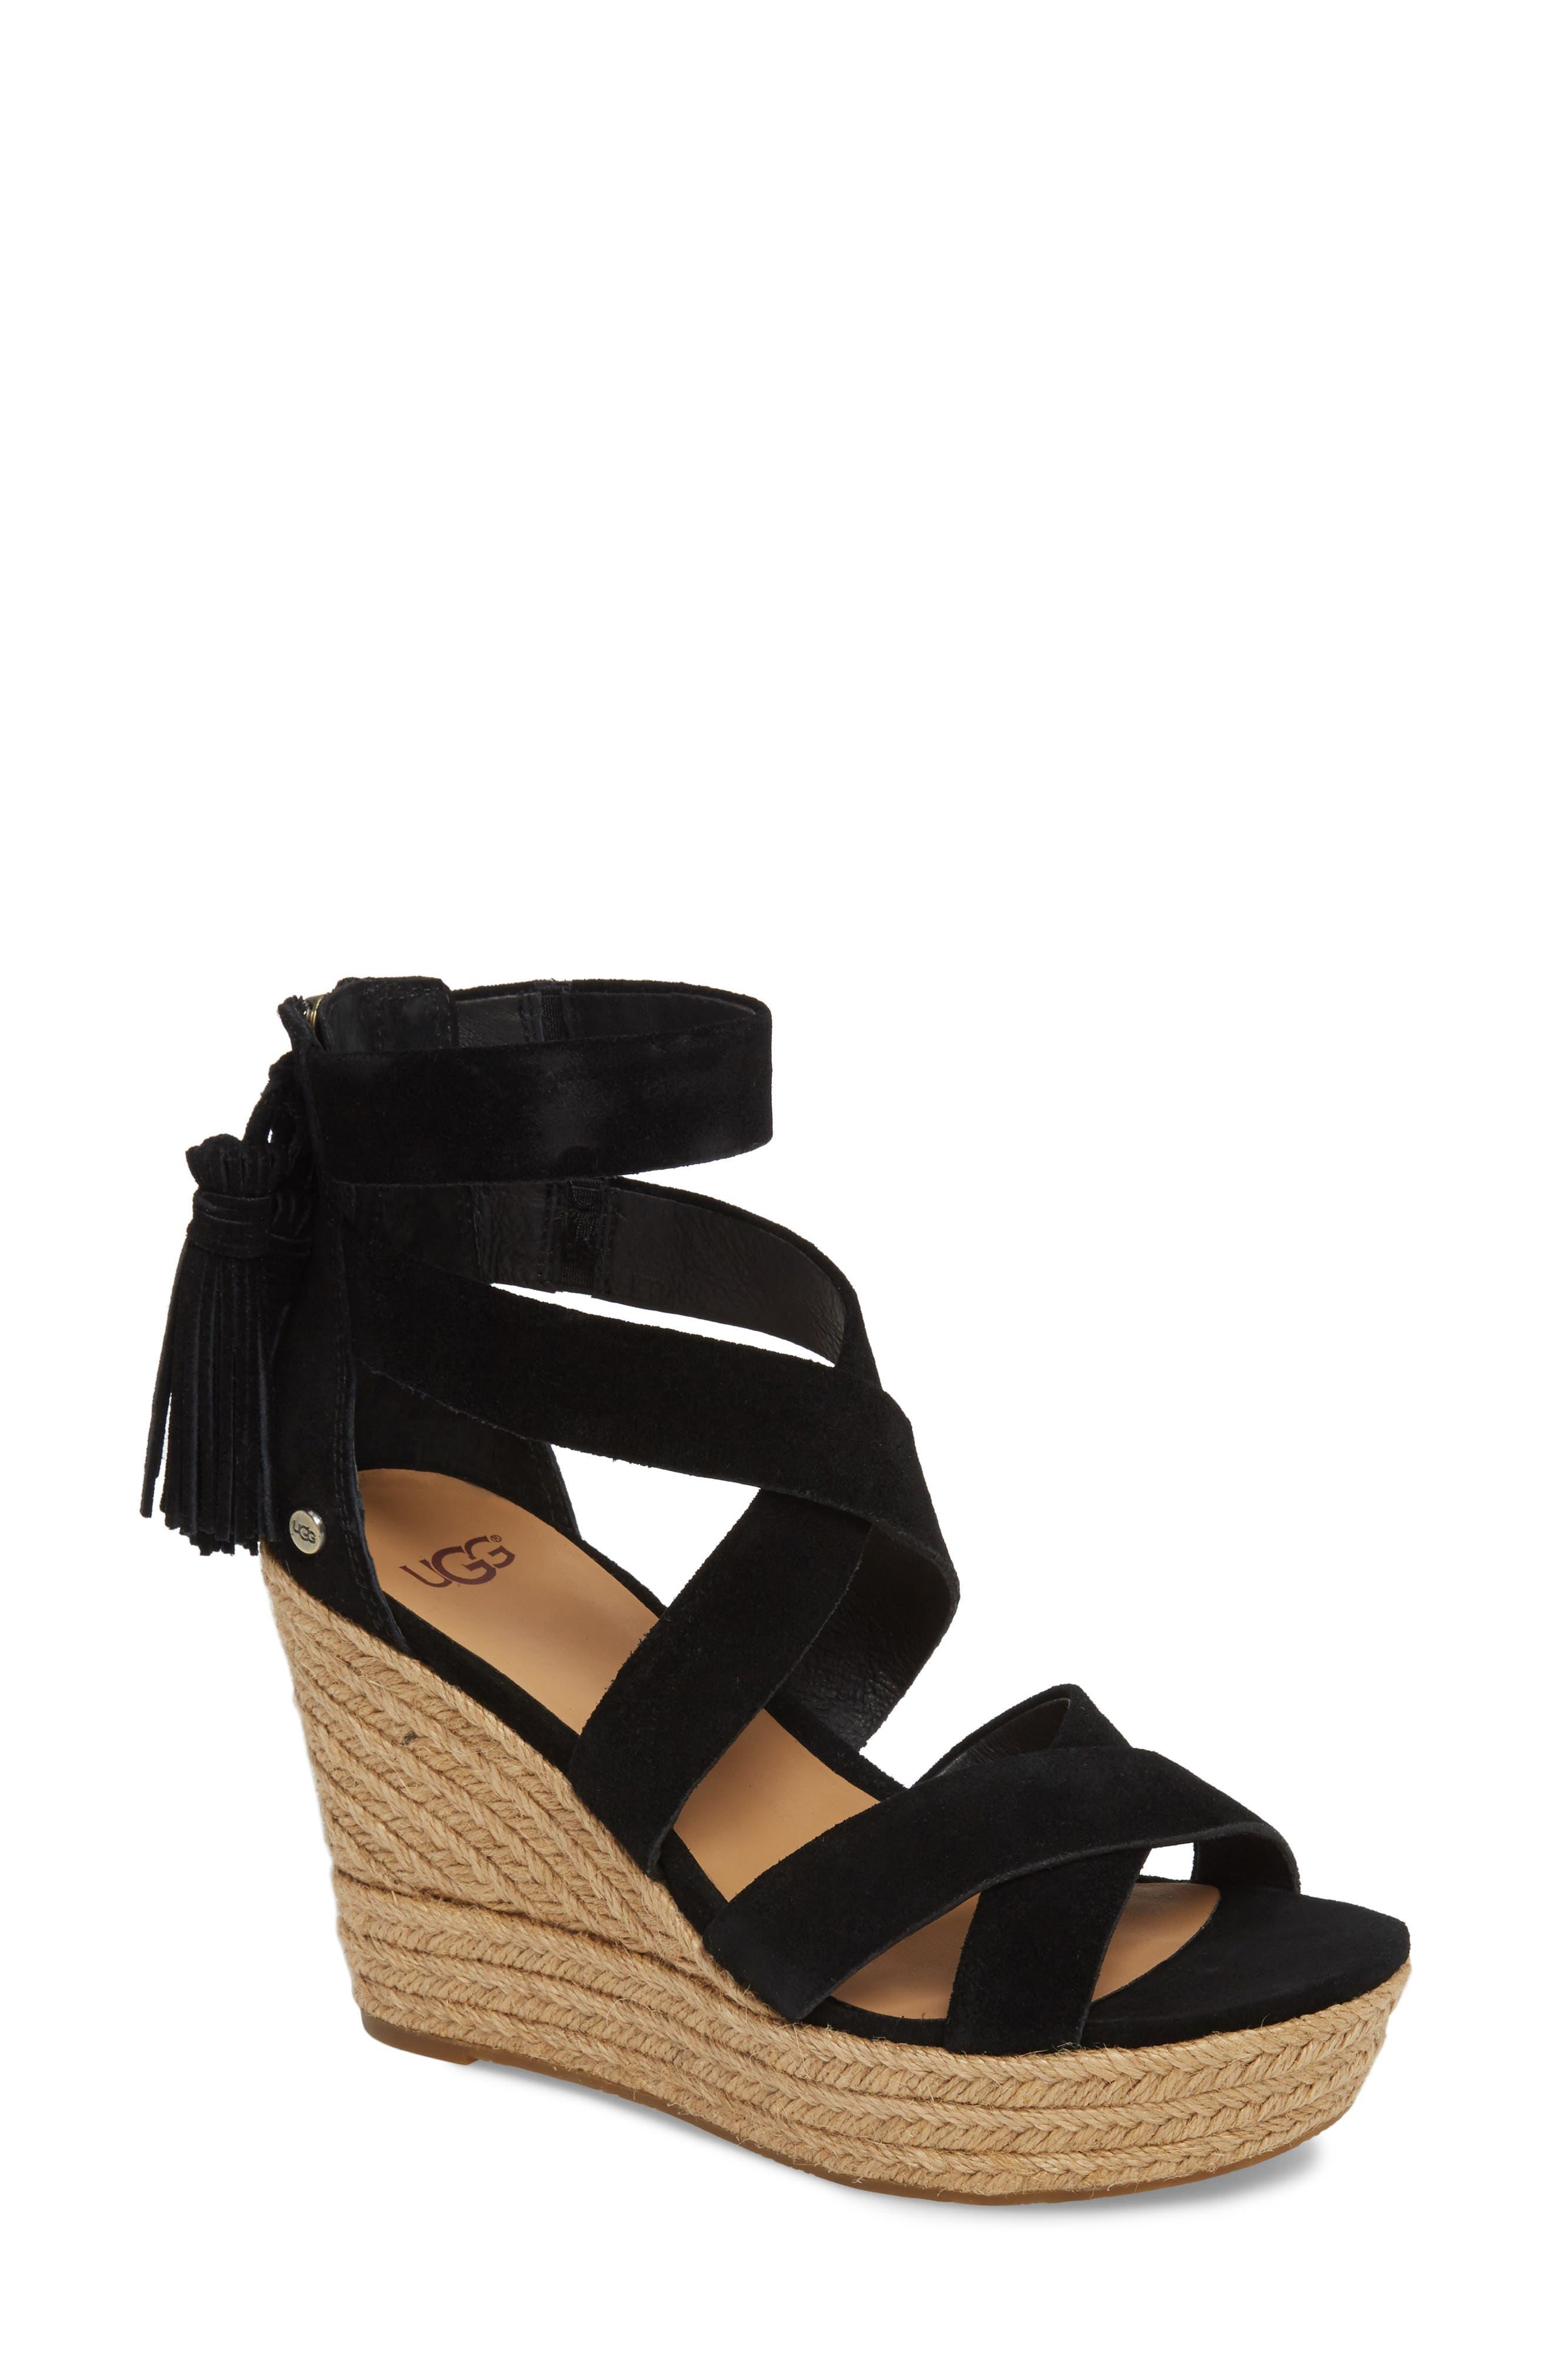 Raquel Platform Wedge Sandal,                         Main,                         color,